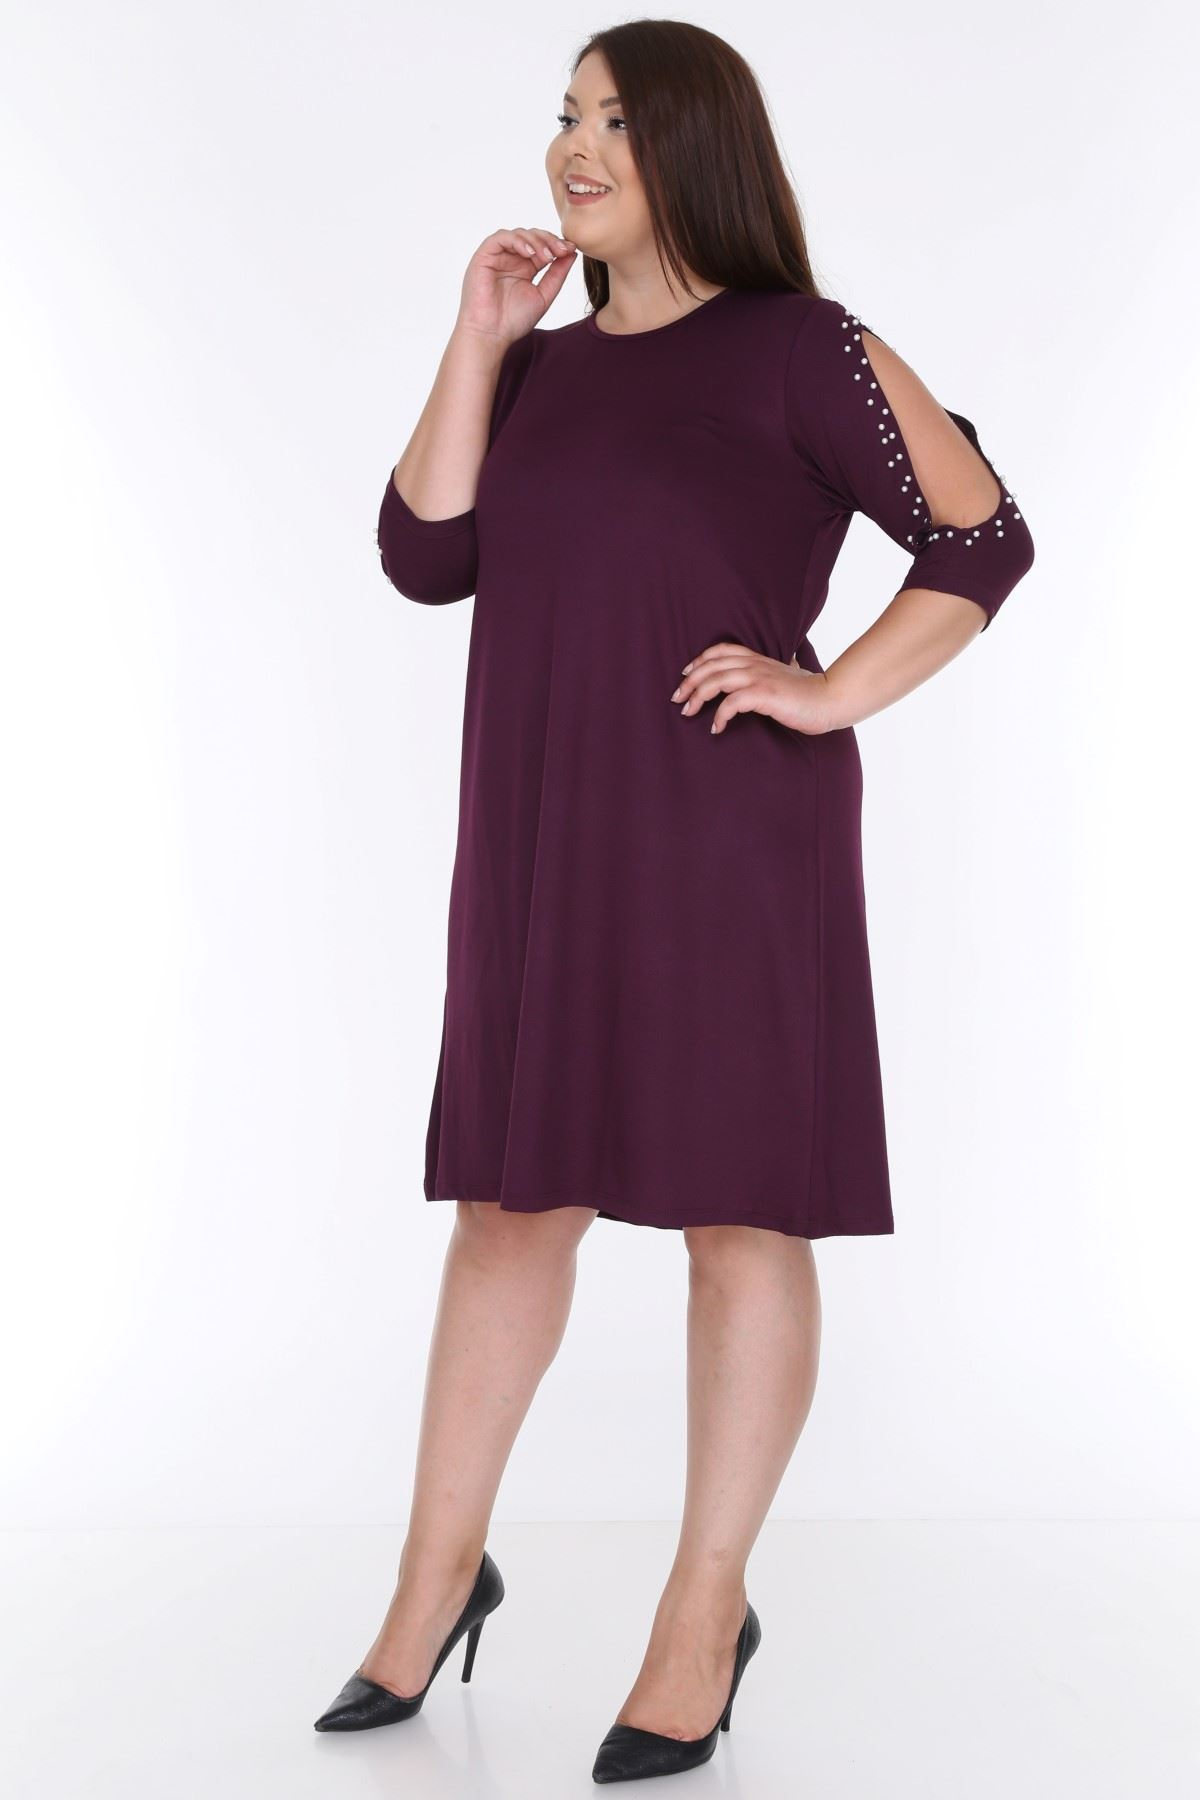 Kol İncili Mor Elbise 9E-0615